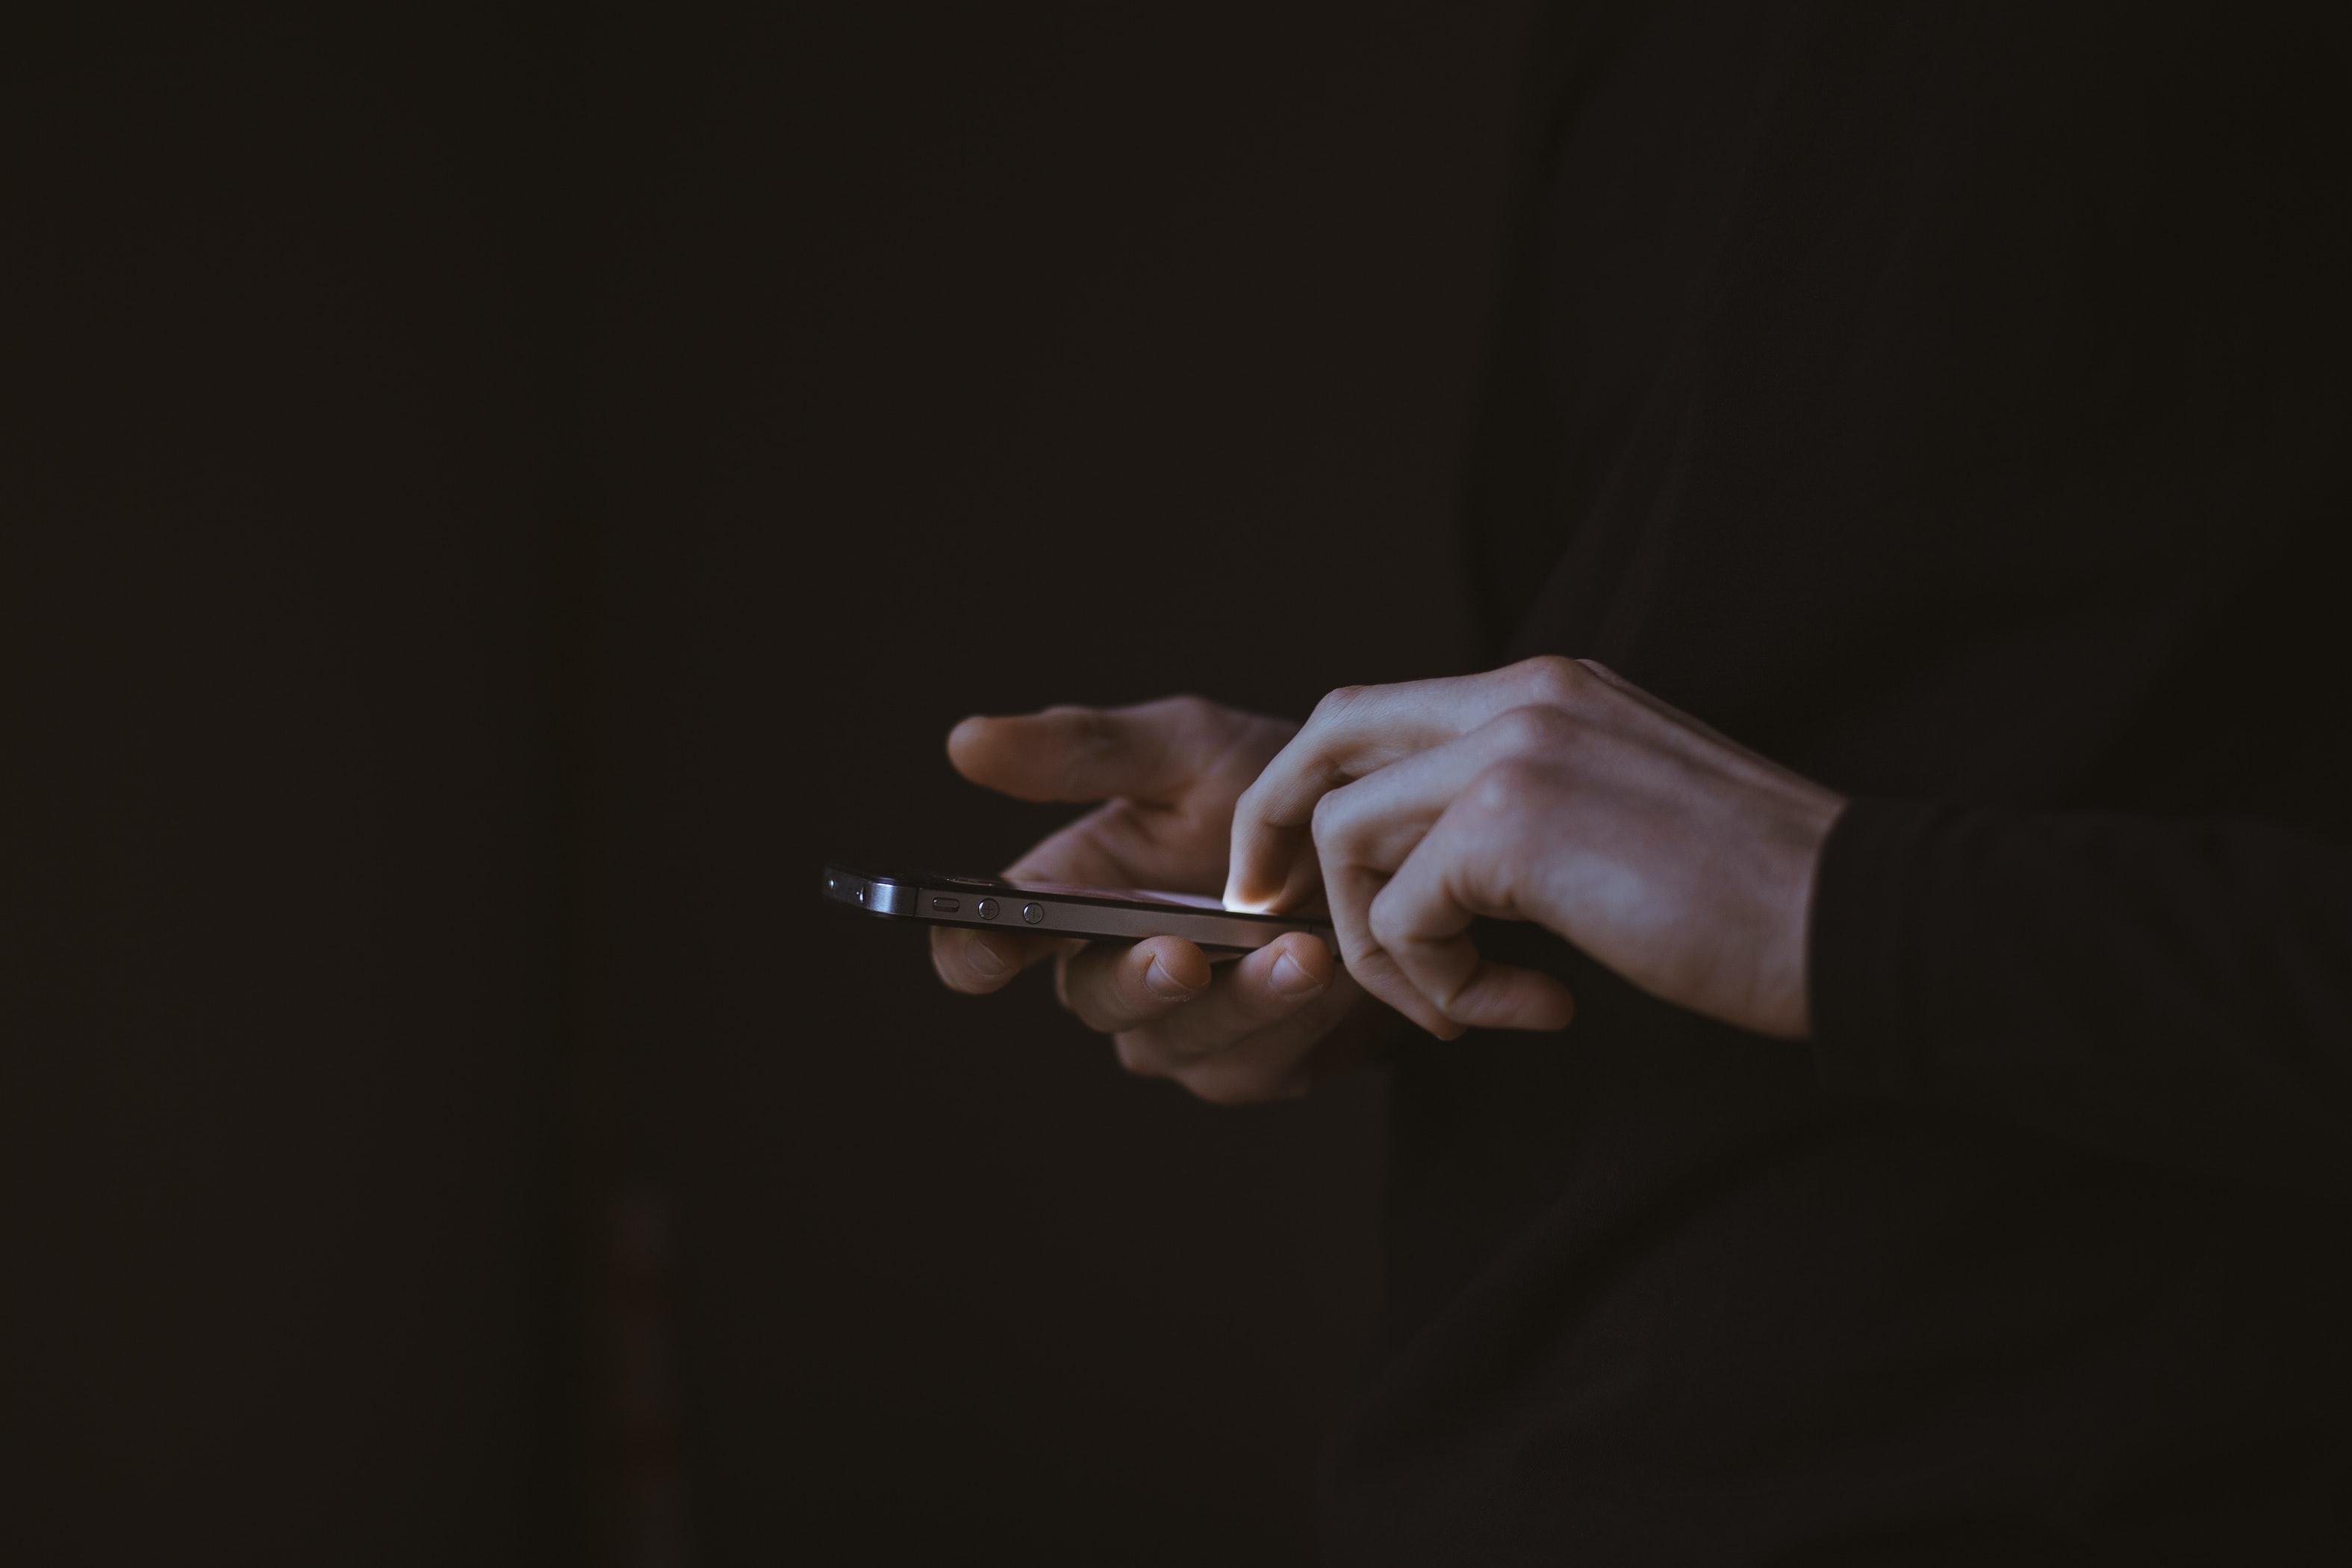 Appsolute_smartphone